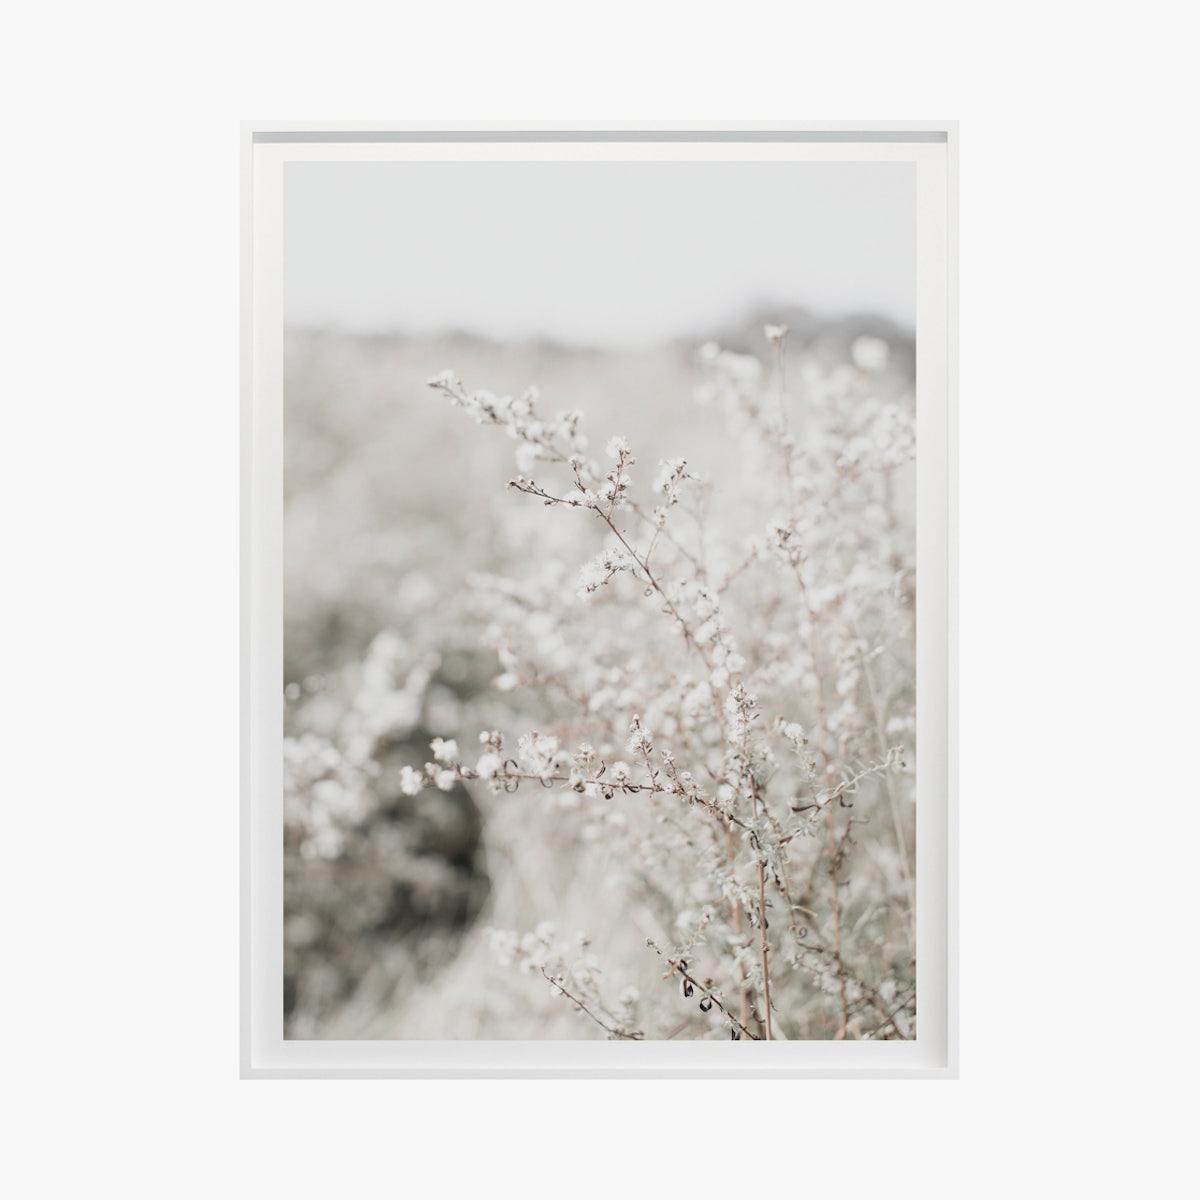 """Fields + Flora No. 5664"" by Cas Friese"